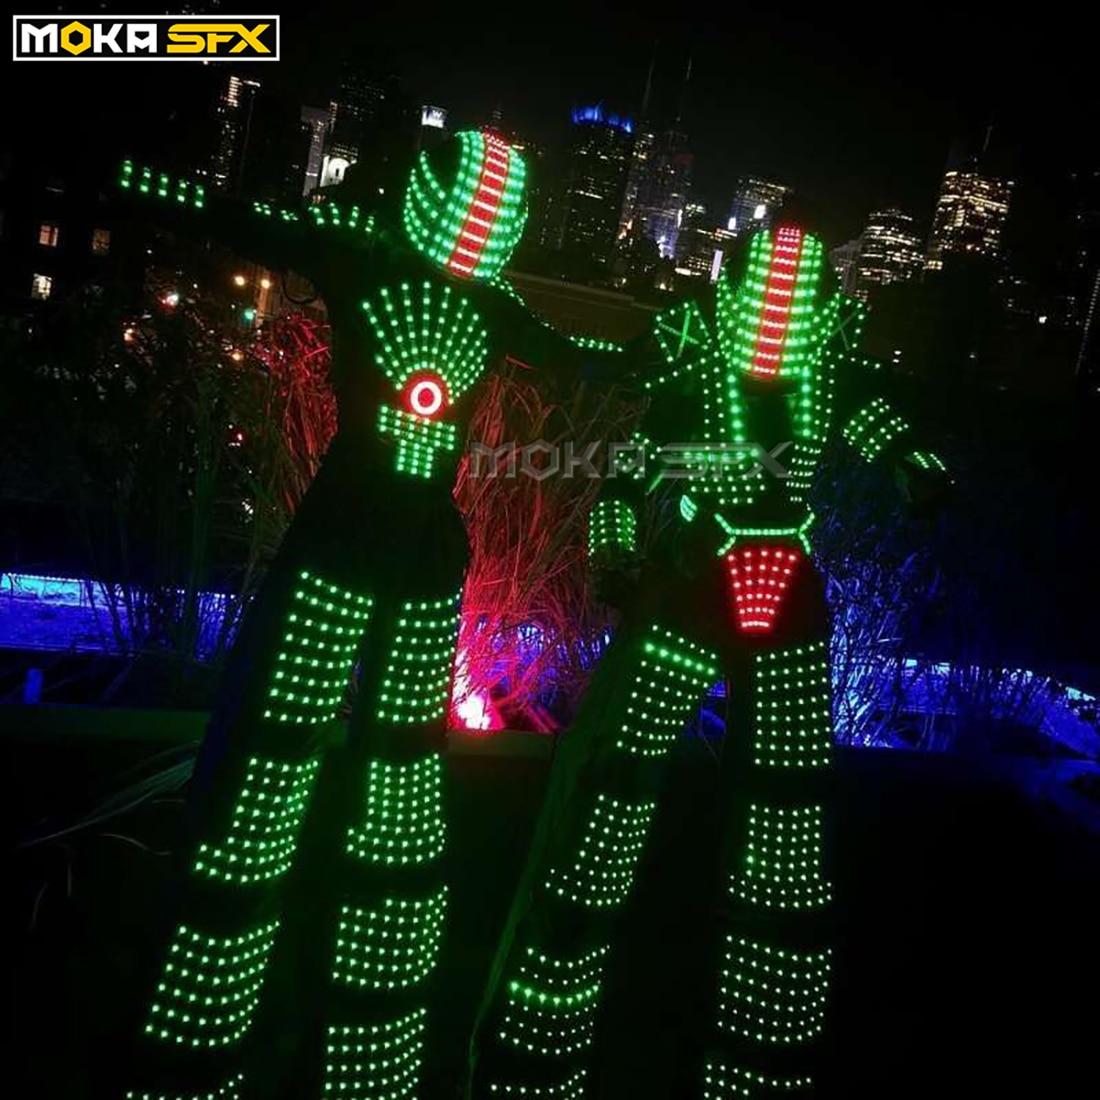 Colorful LED Light Robot Luminous Suit Costume Men LED Luminous Clothing Dance Wear For Night Clubs Party KTV Supplies